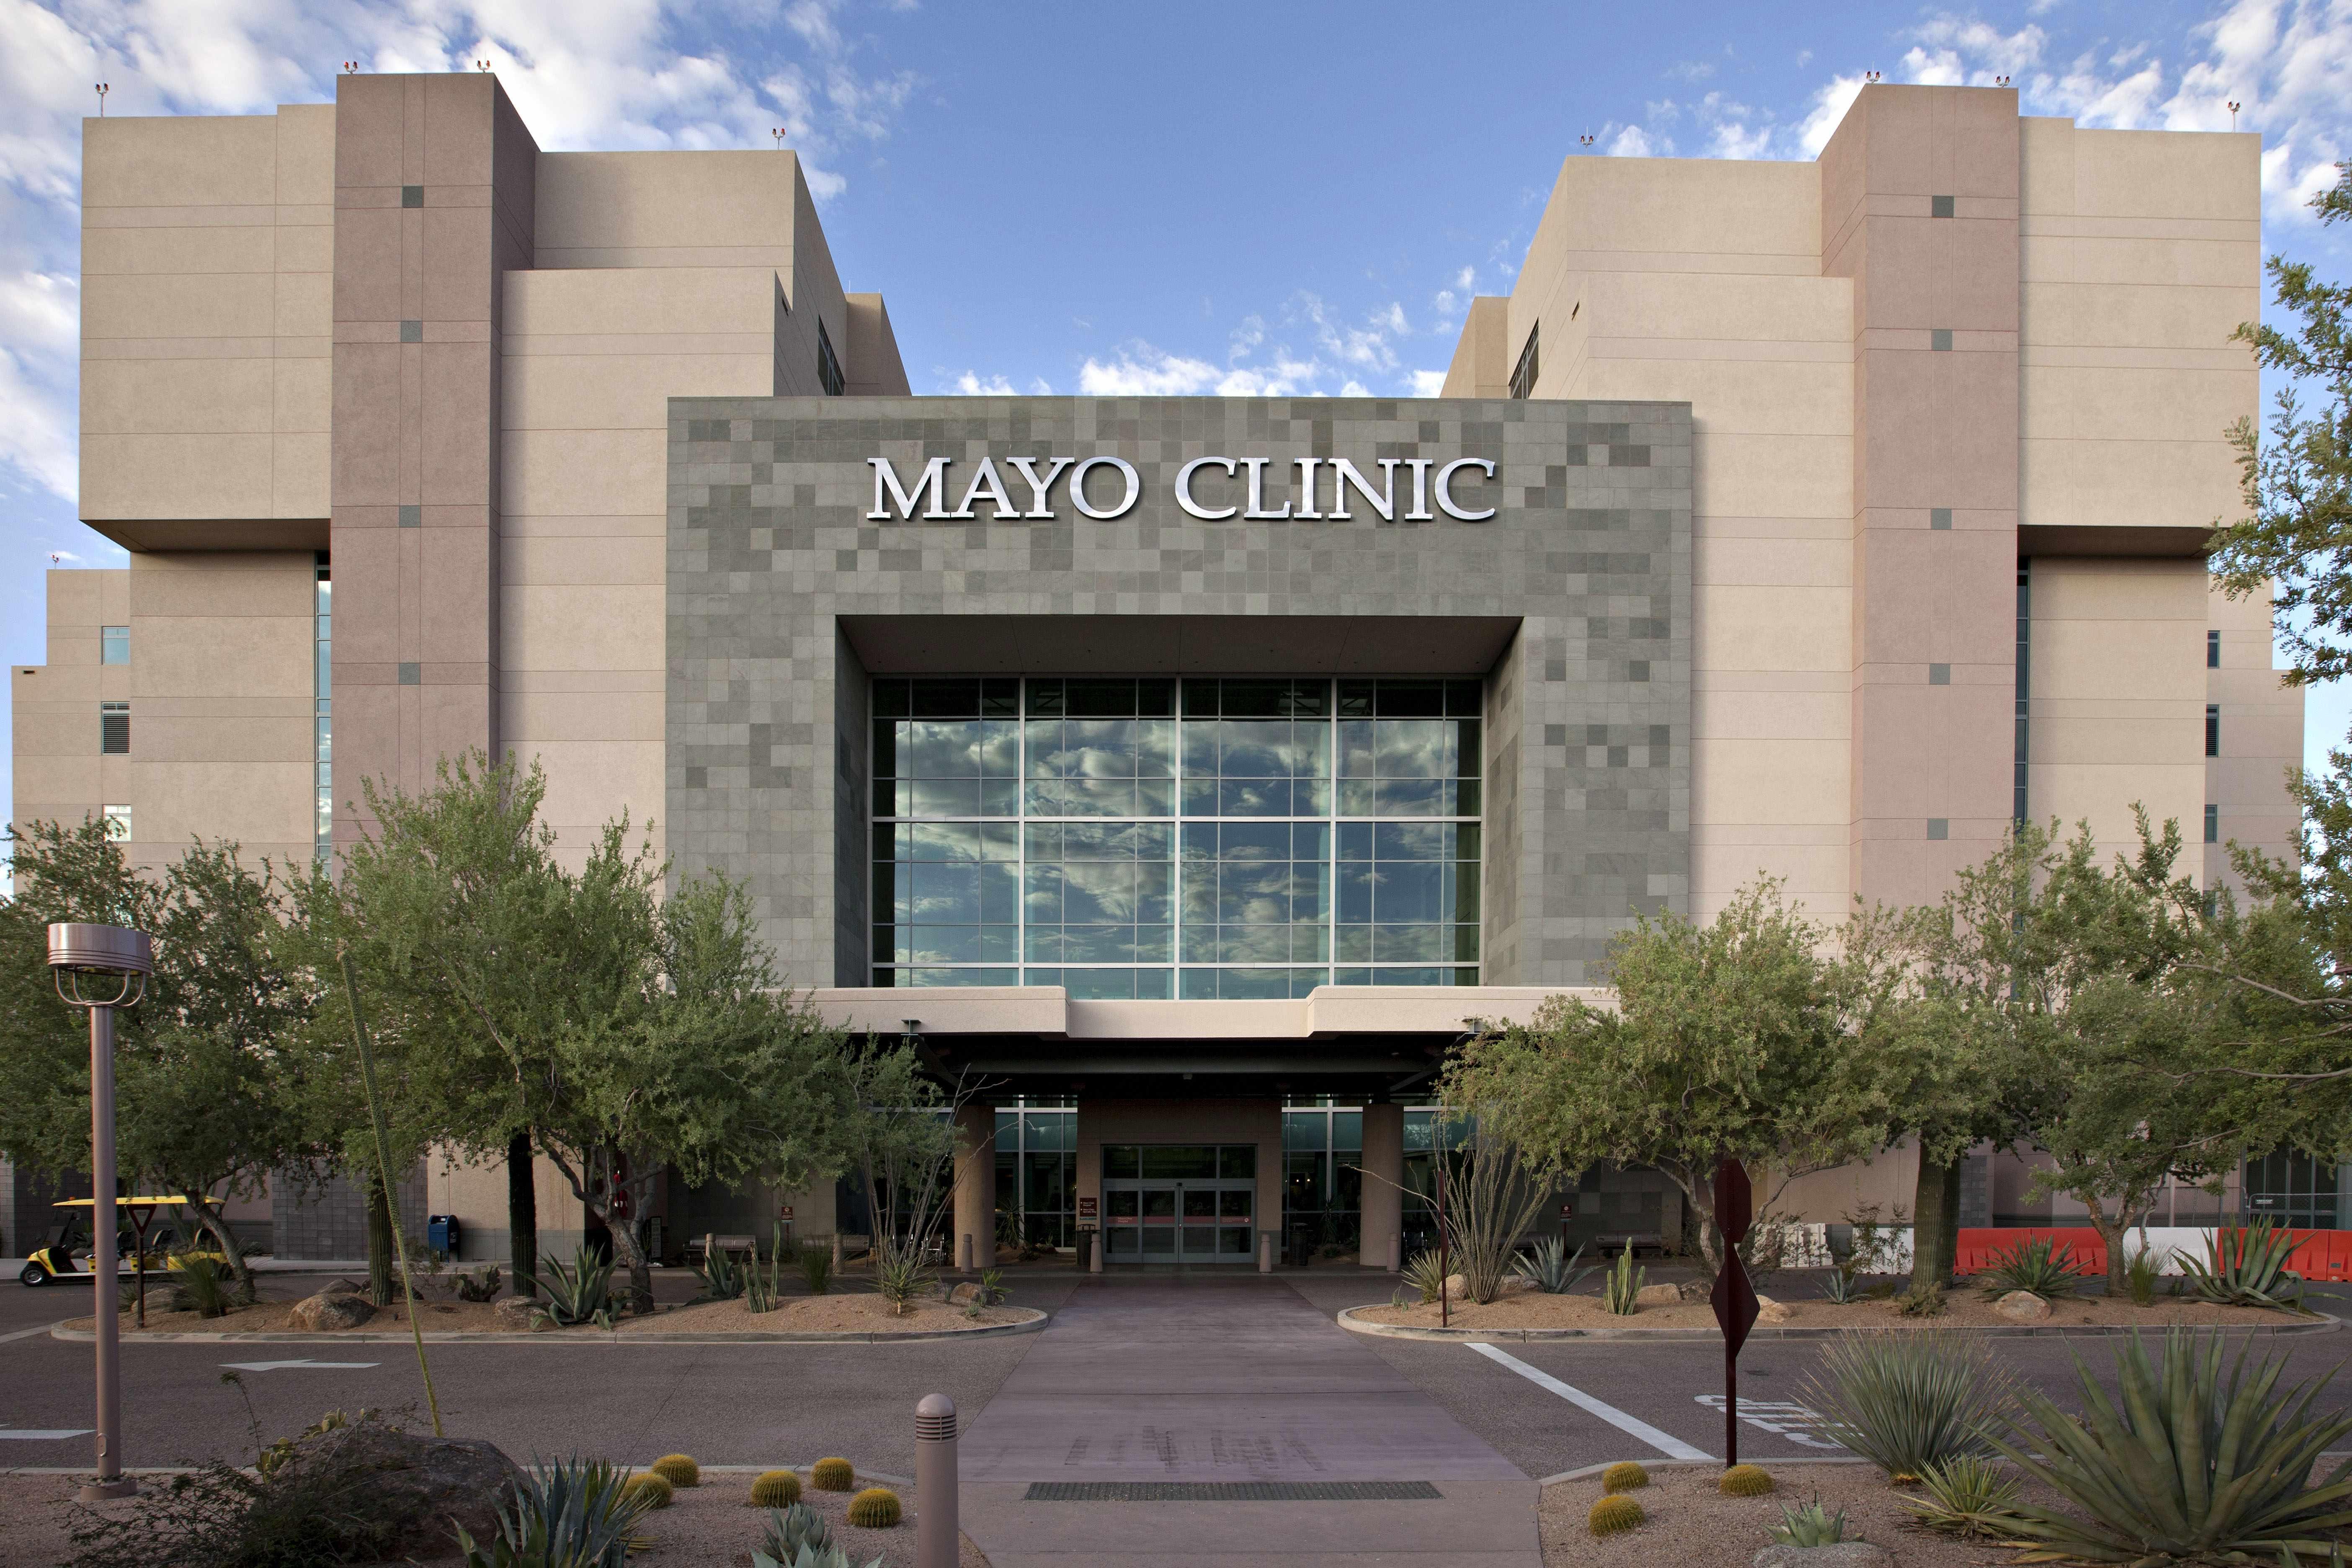 Mayo Clinic en Phoenix, Arizona